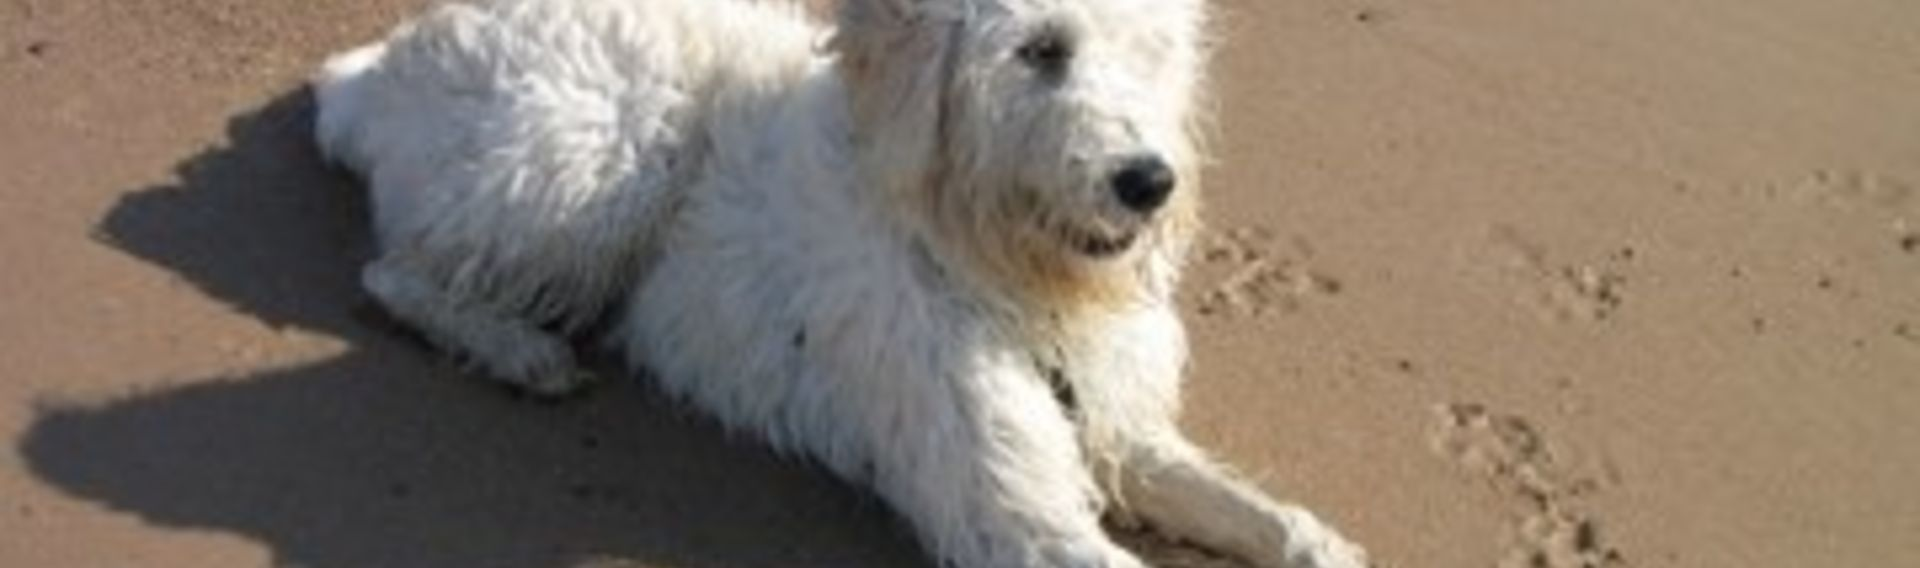 Hundestrand Urlaub Kampen mit Hund Sylt